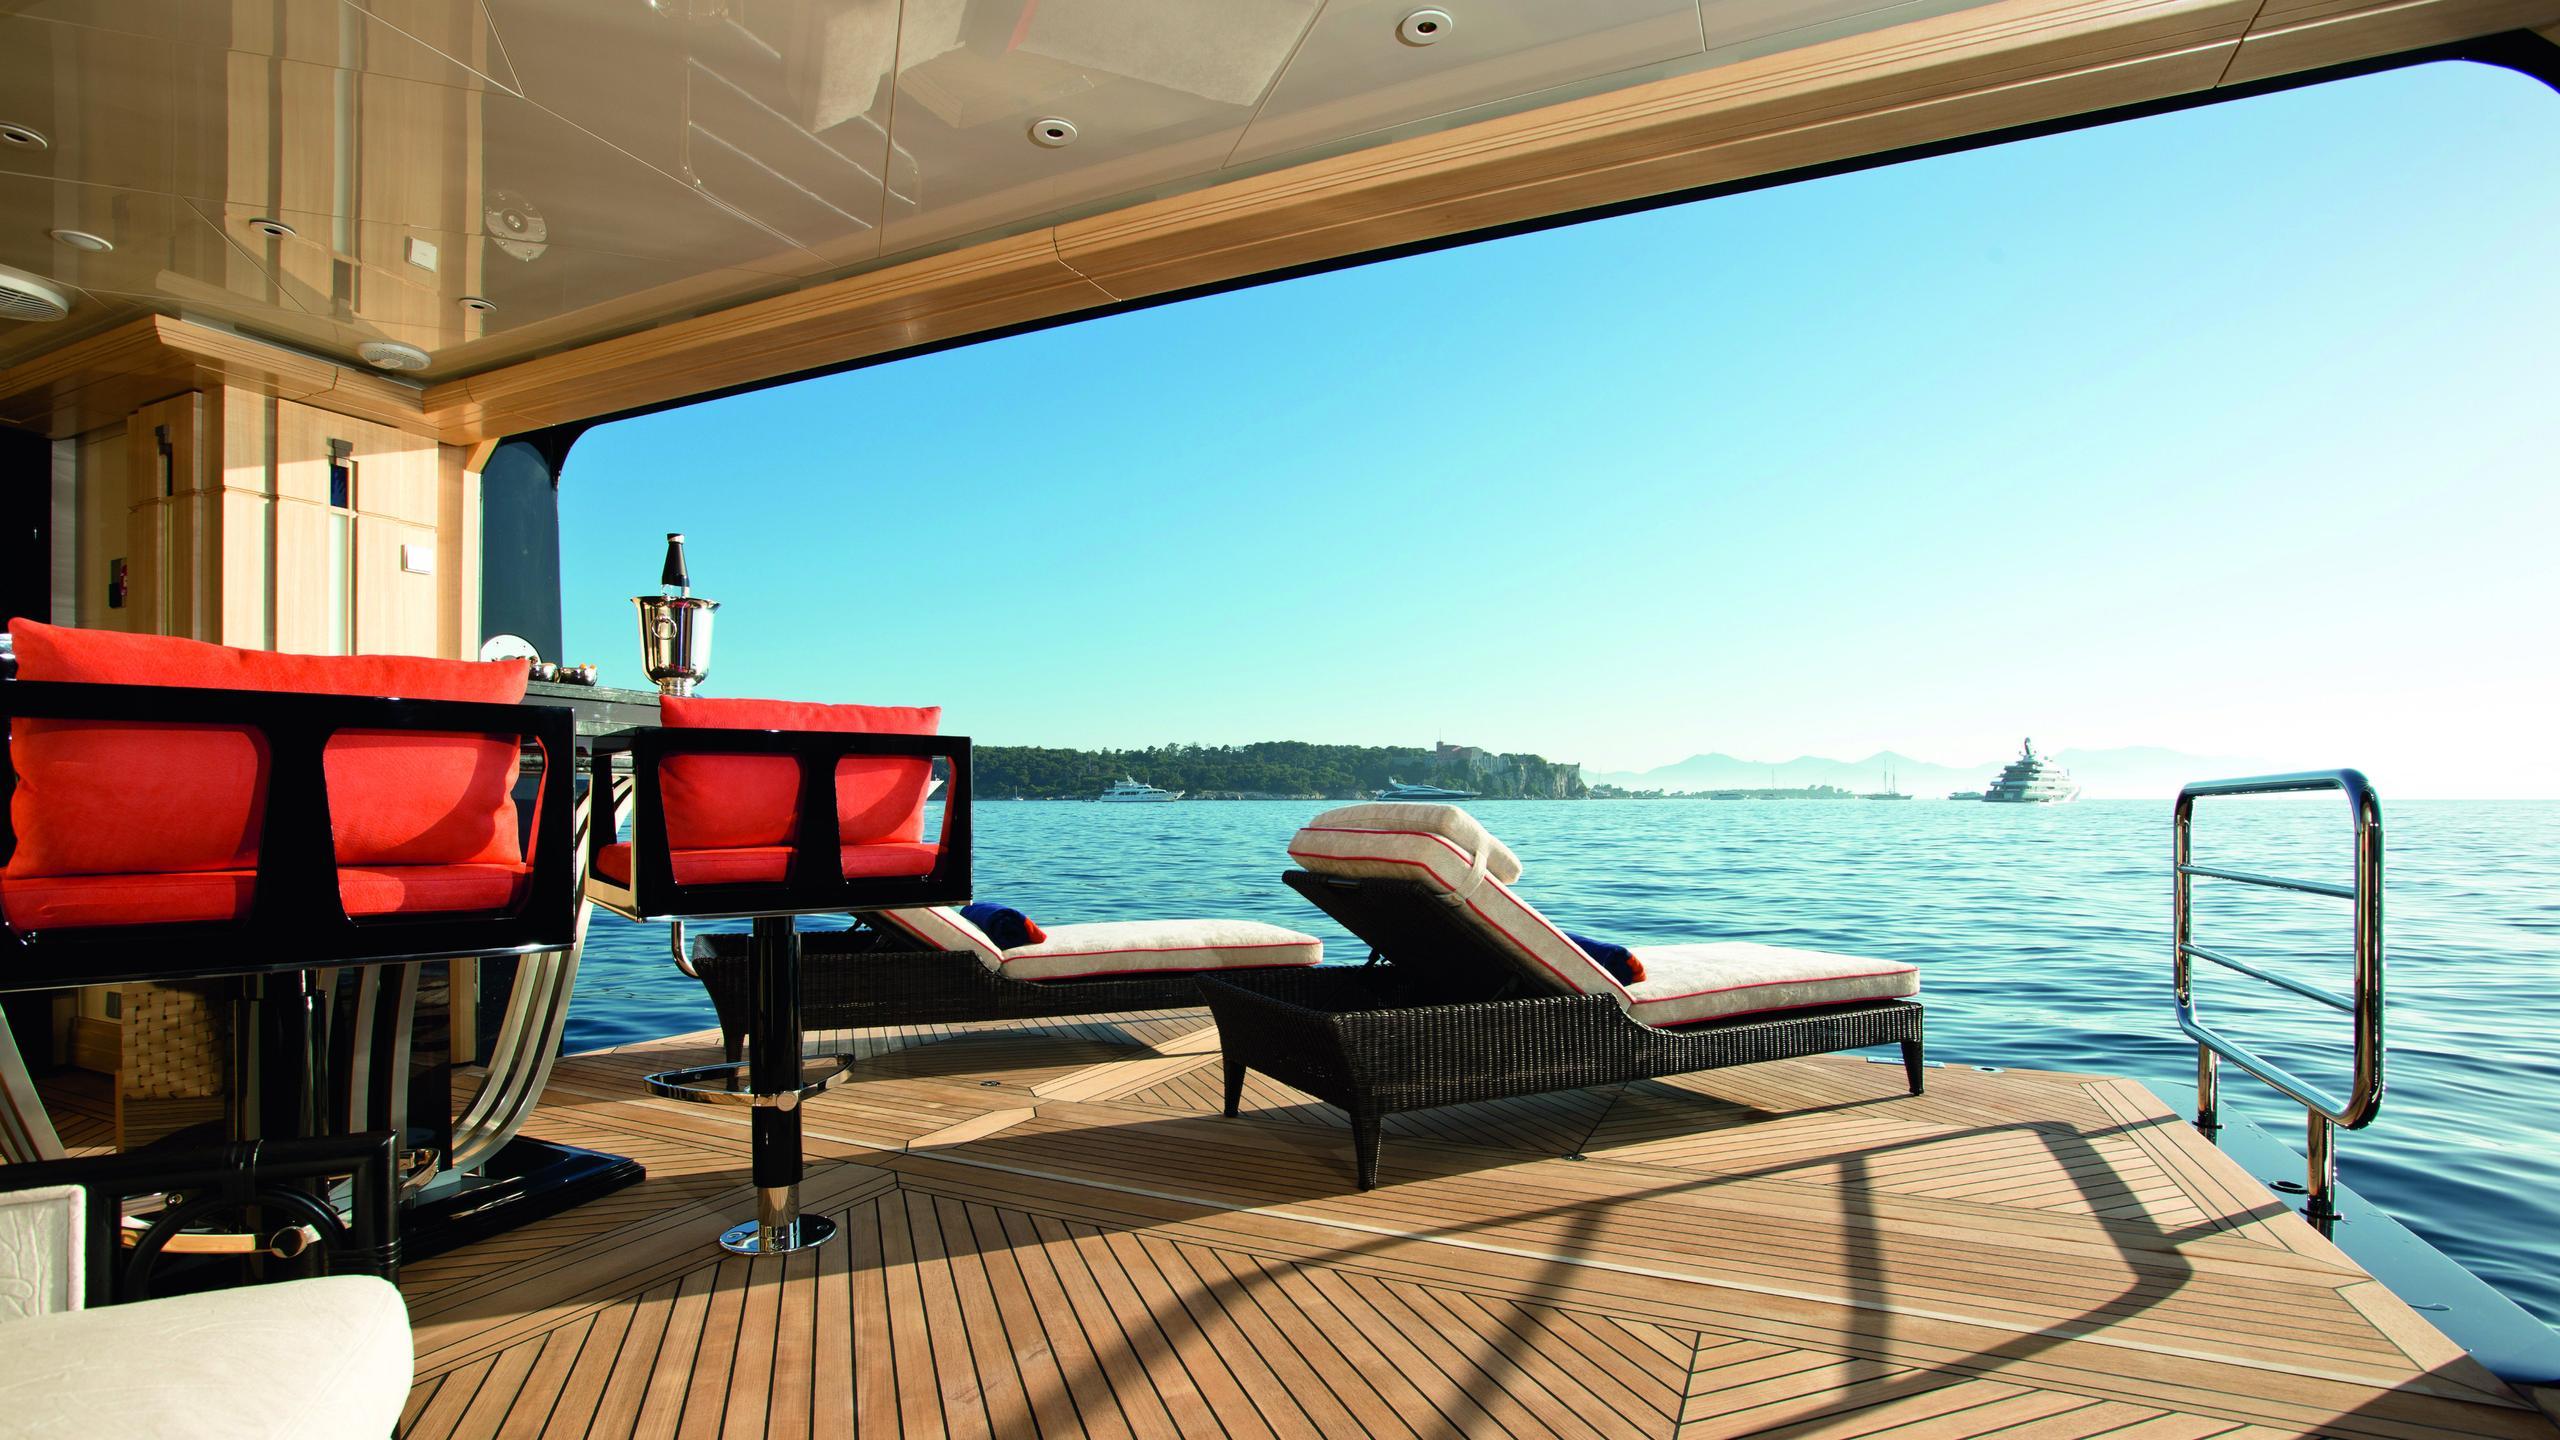 Excellence-V-motor-yacht-abeking-rasmussen-2012-60m-beach-club